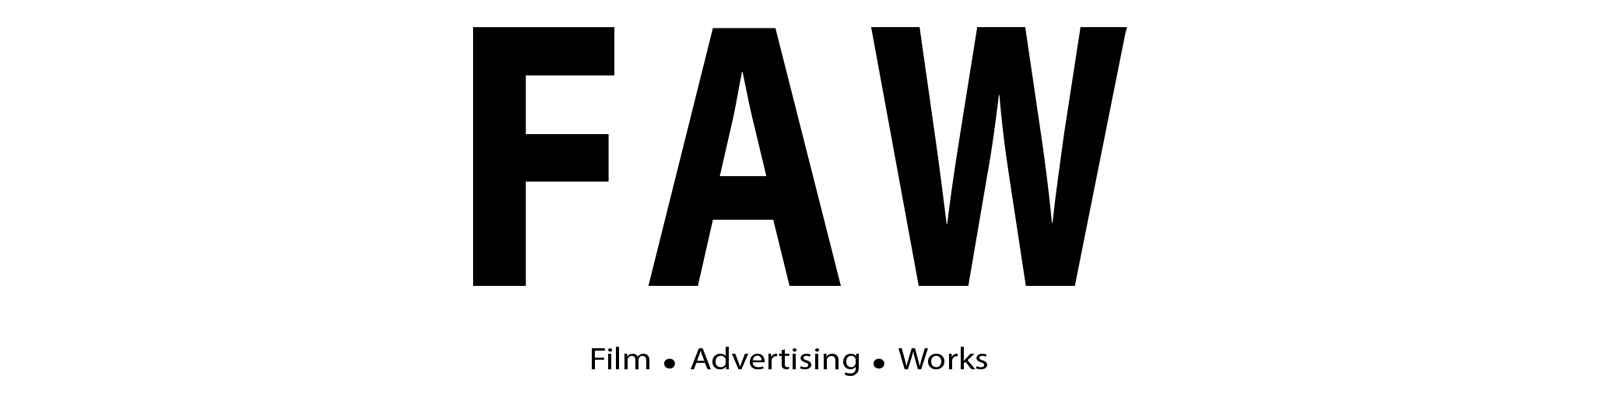 Faw Film Production banner fotograf